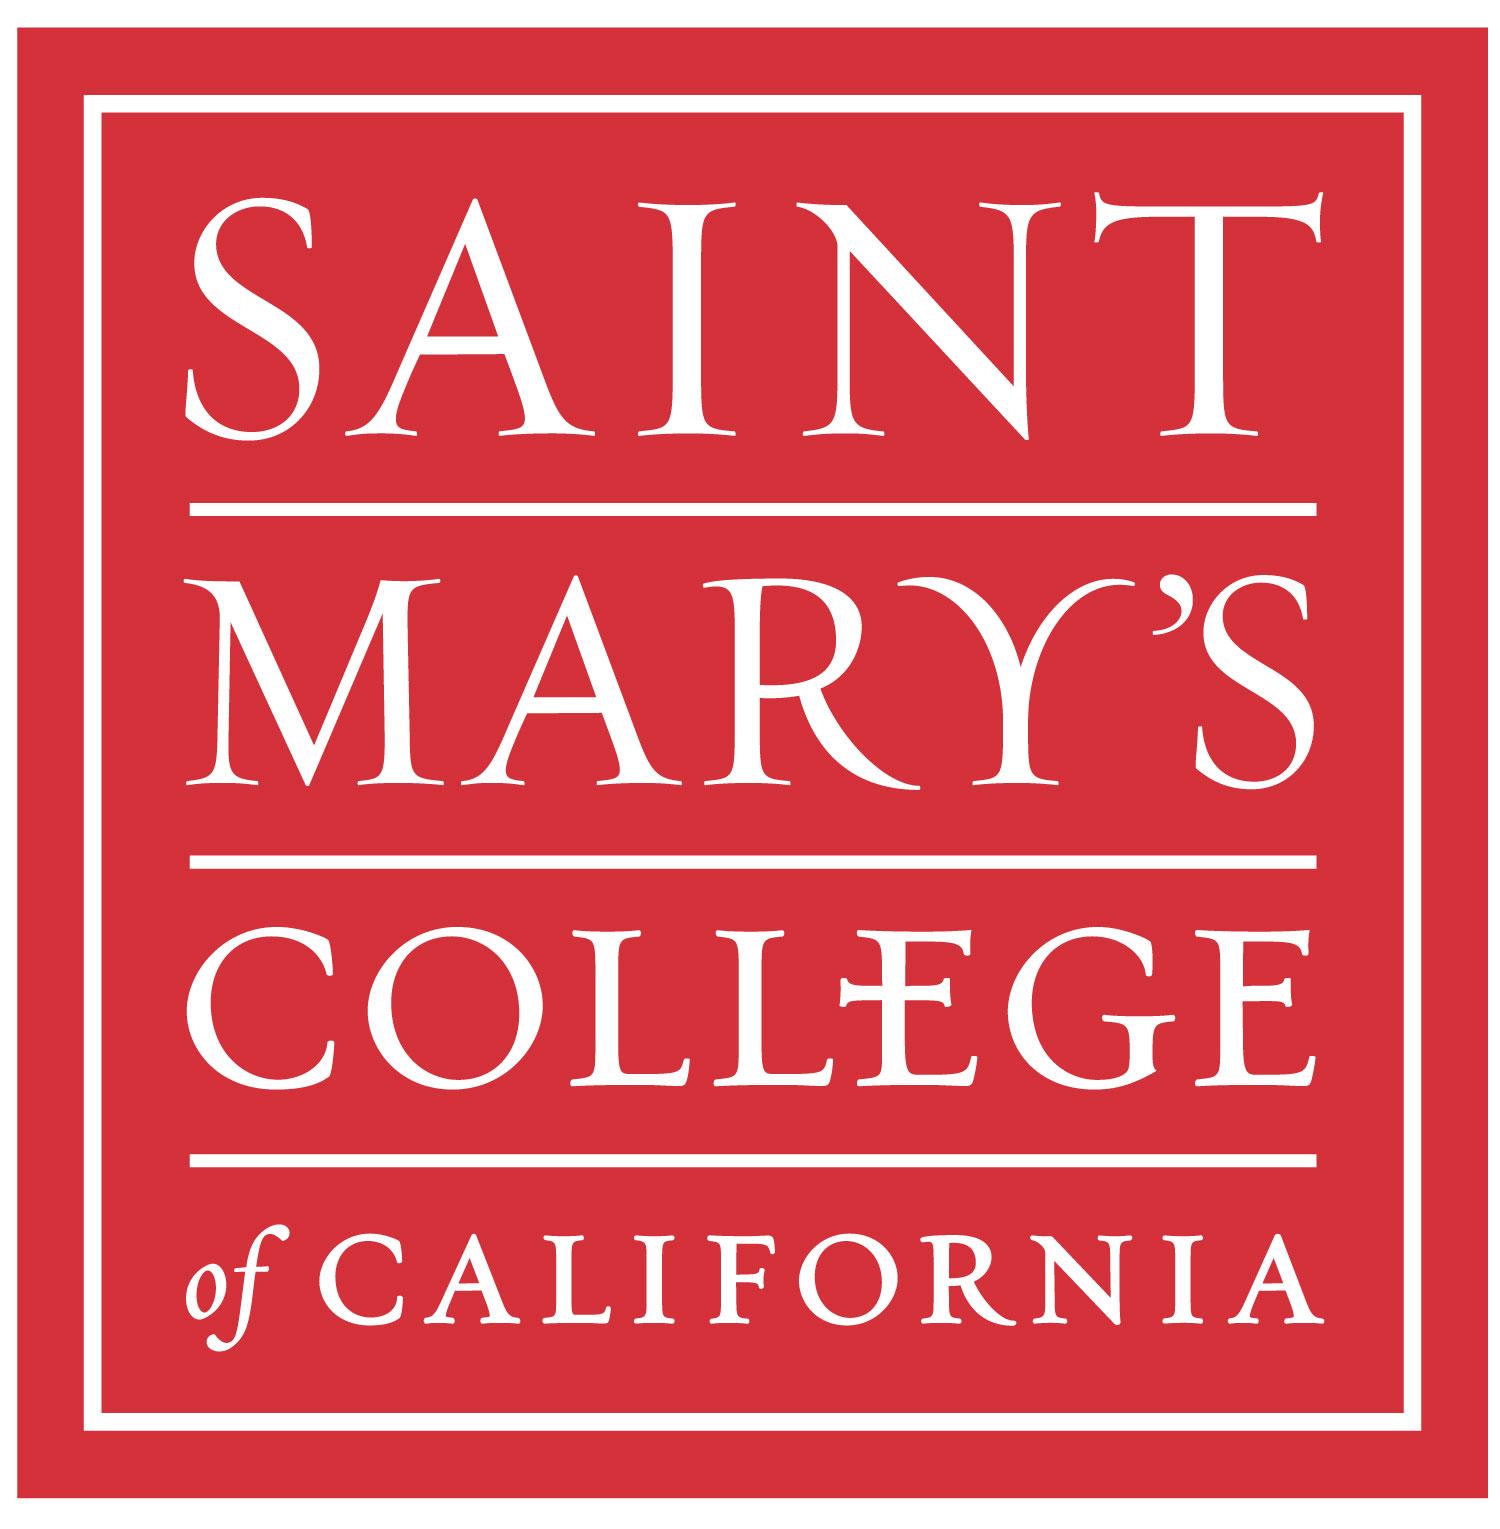 Saint Mary's College